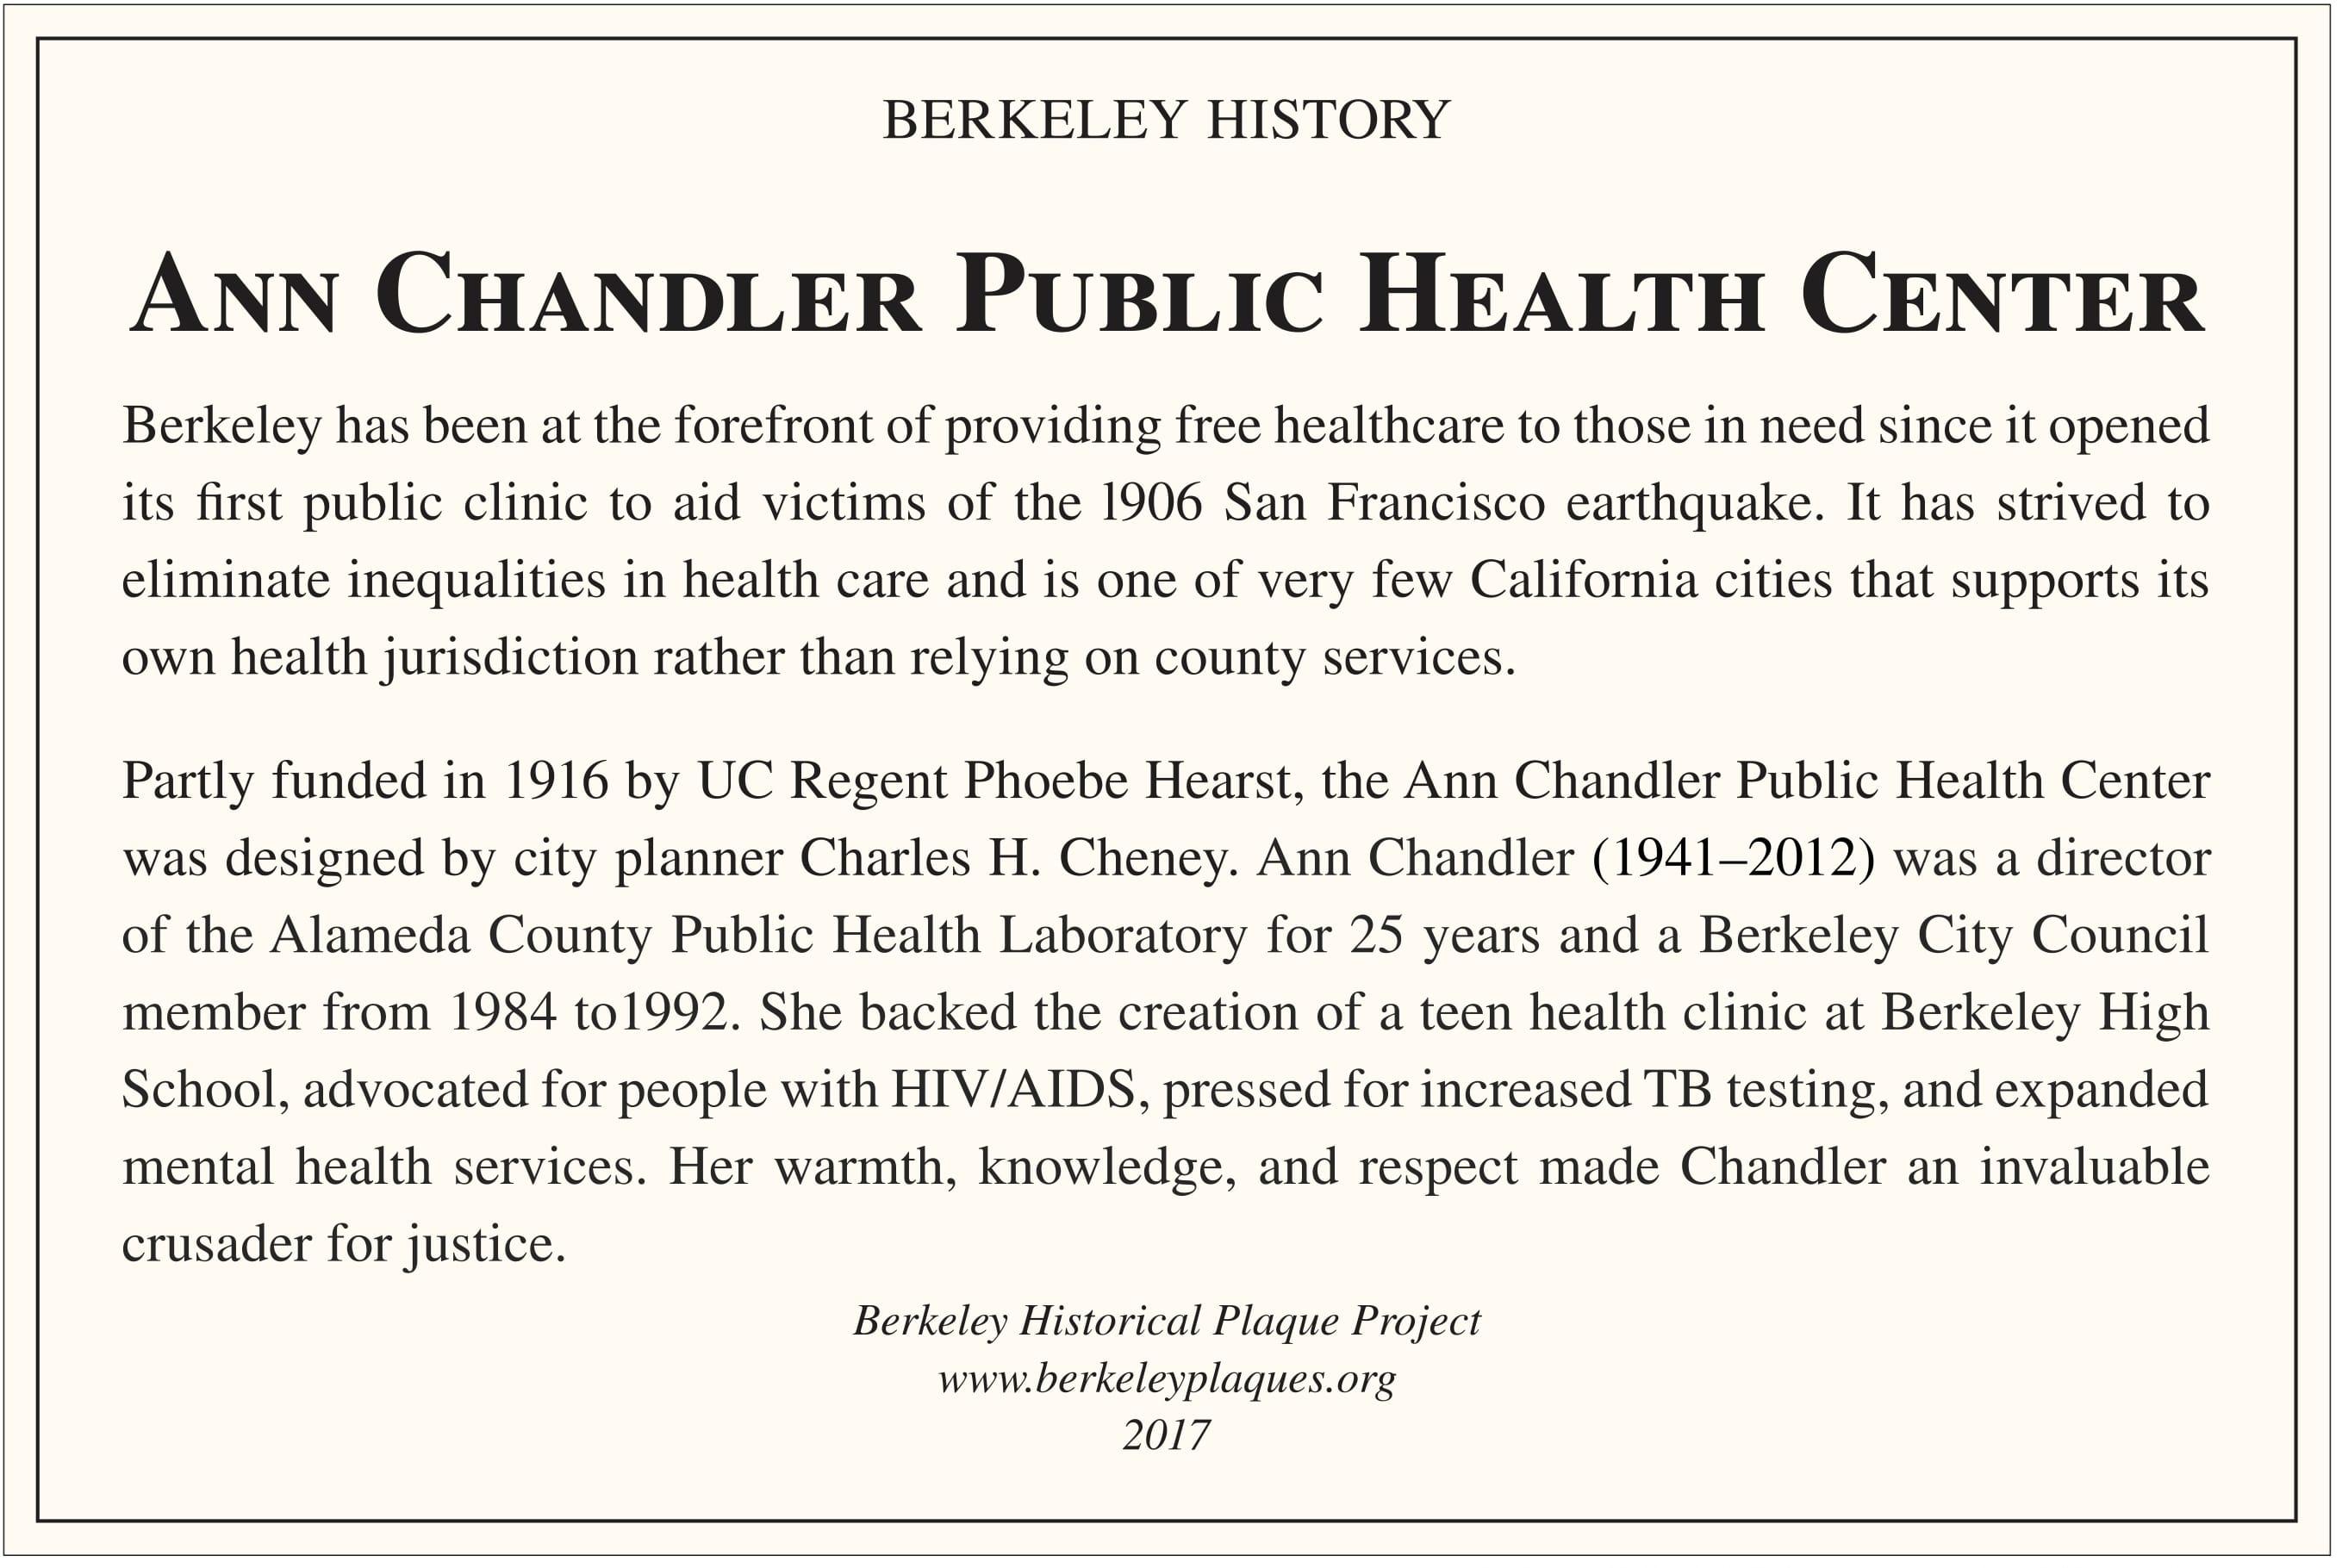 Ann Chandler Public Health Center Plaque